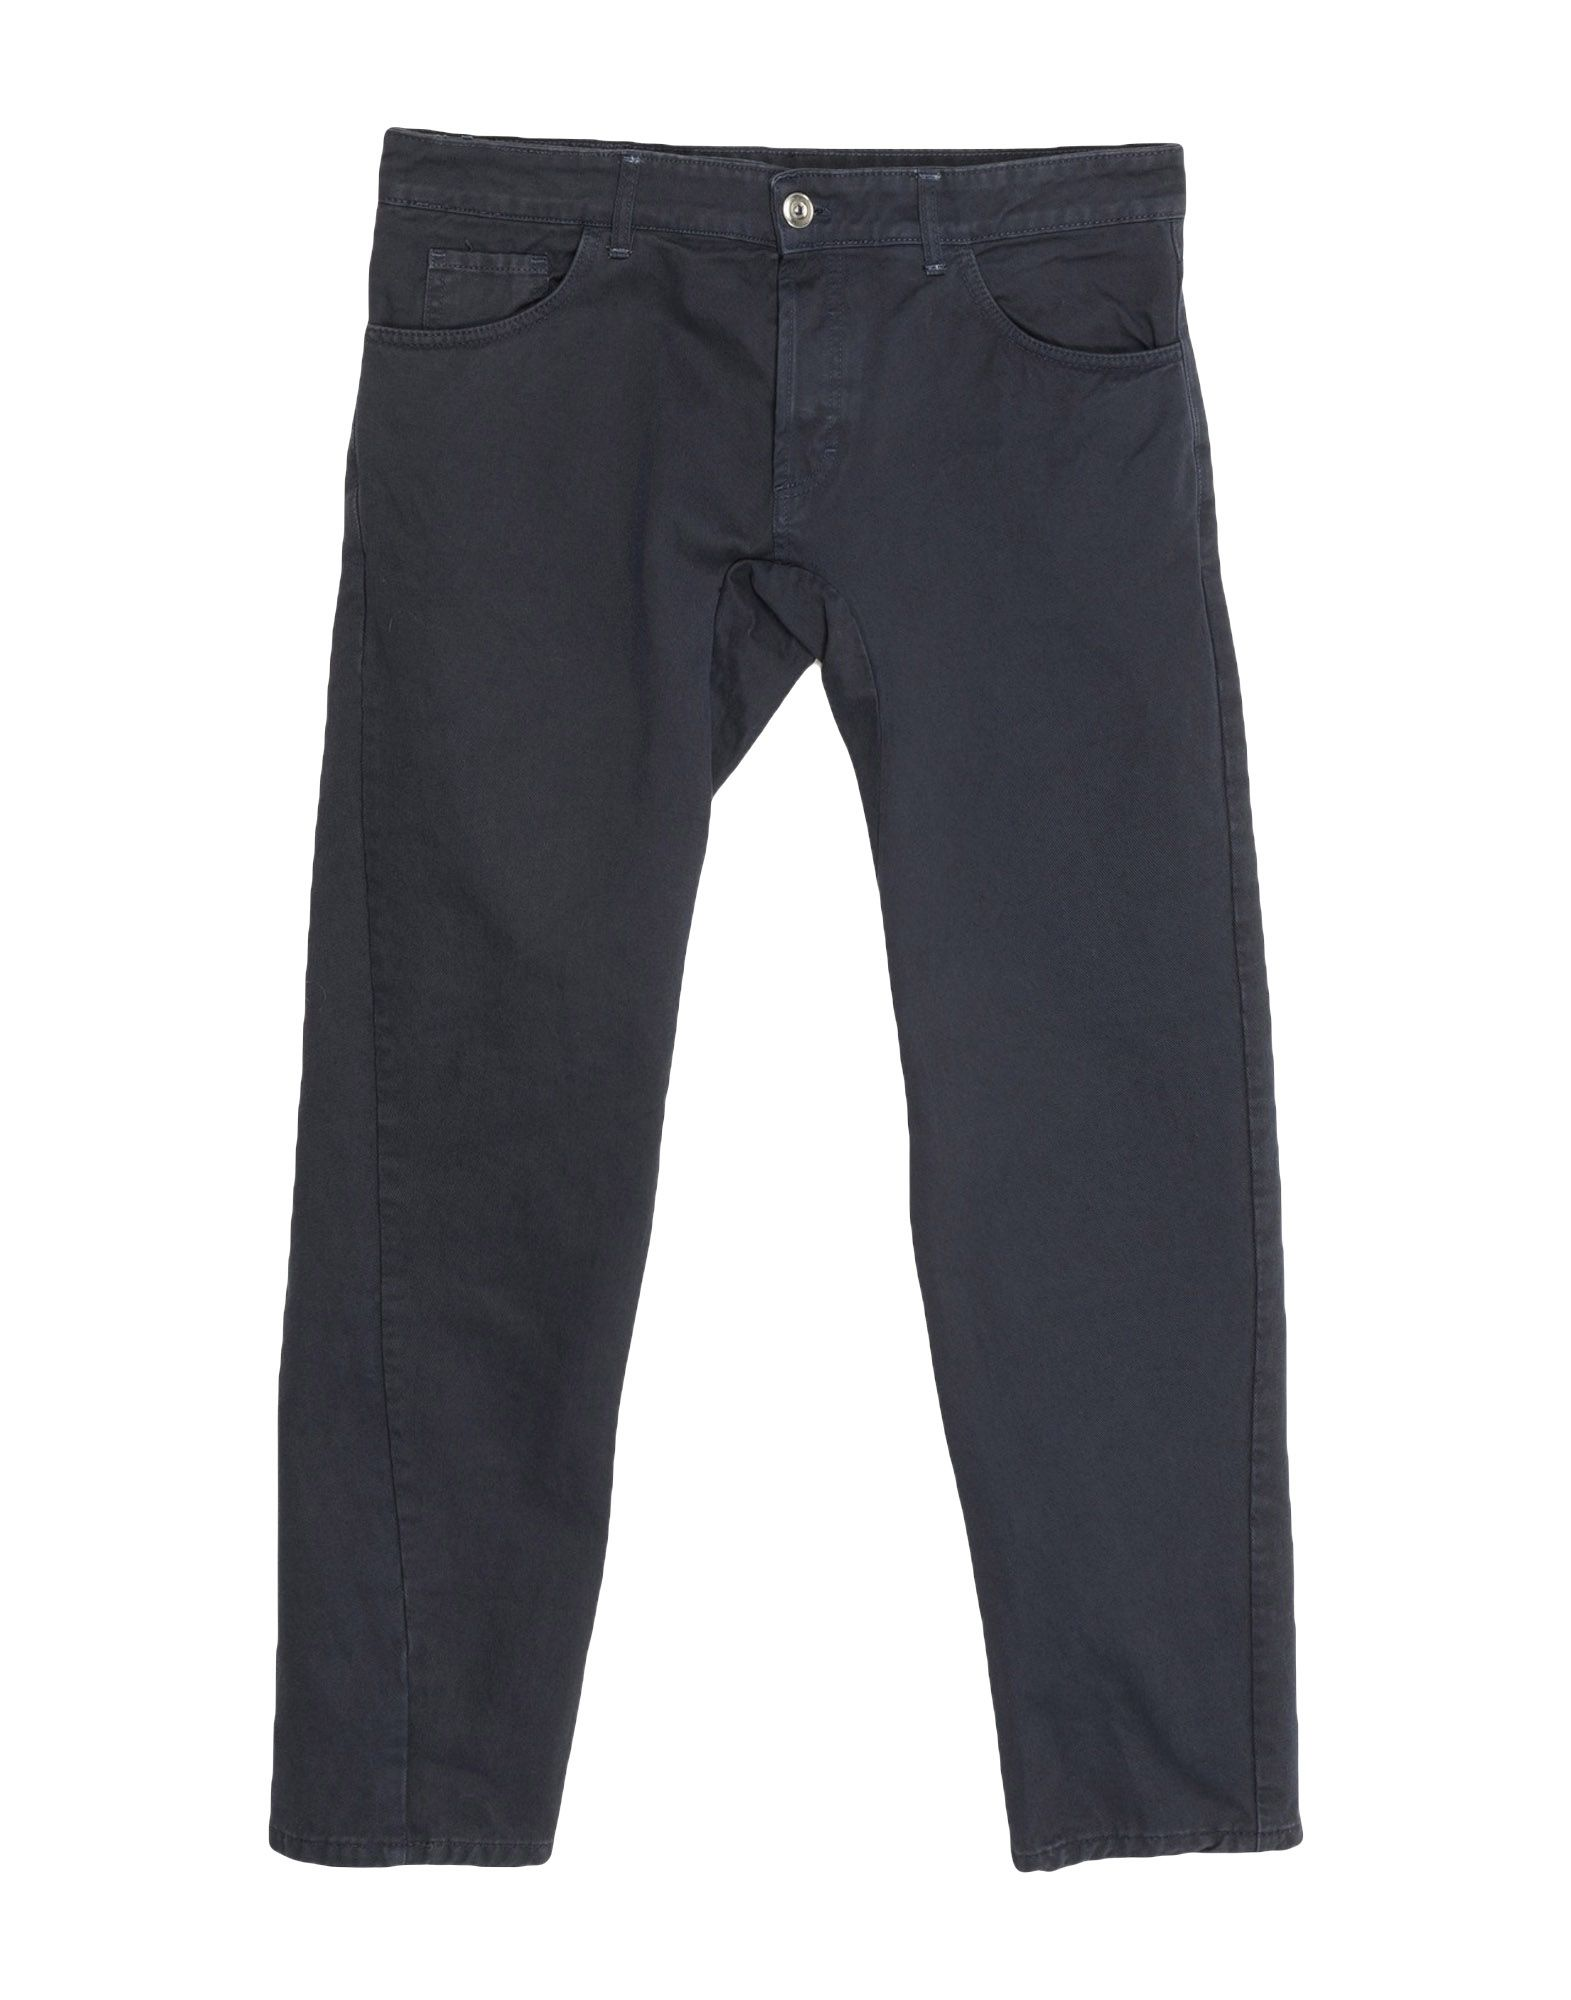 PIERRE BALMAIN Повседневные брюки pierre balmain повседневные шорты